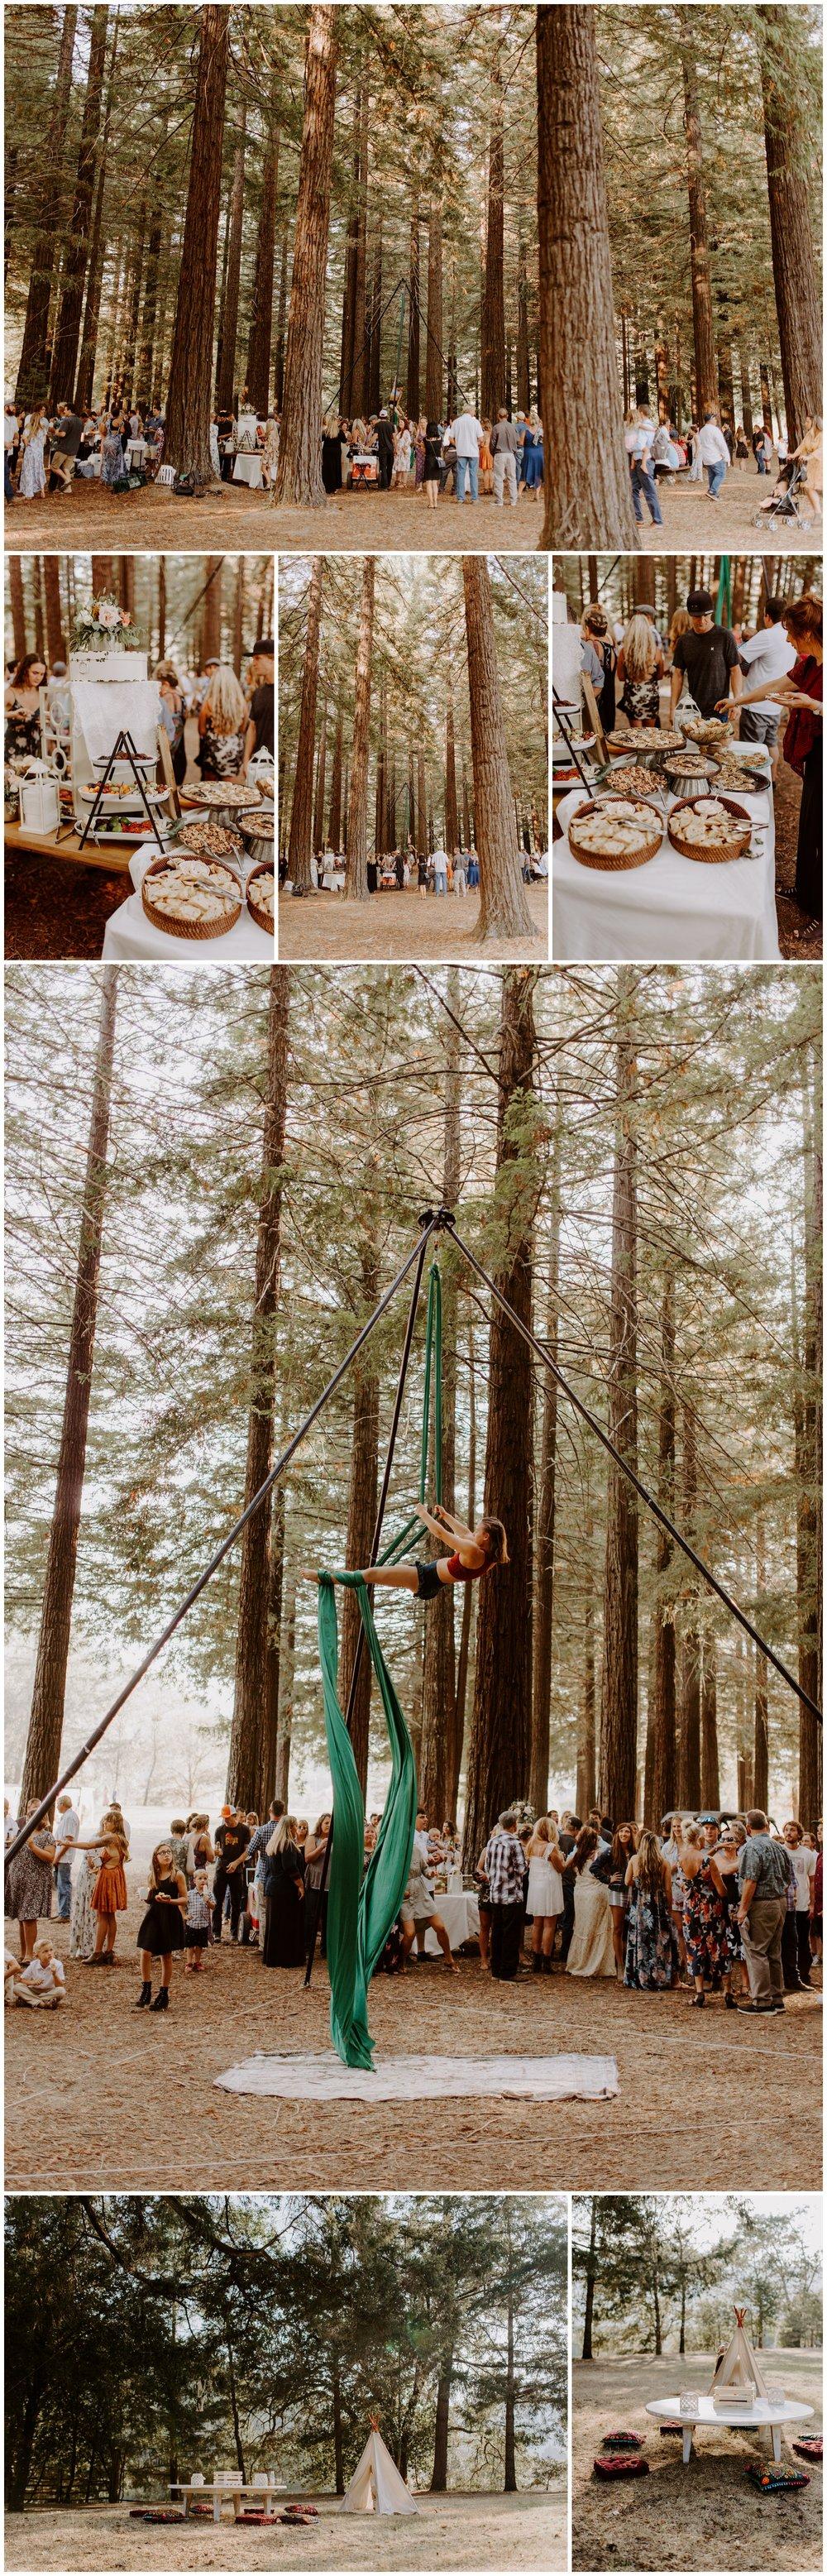 Redwood Festival Wedding Humbolt California - Jessica Heron Images_0076.jpg